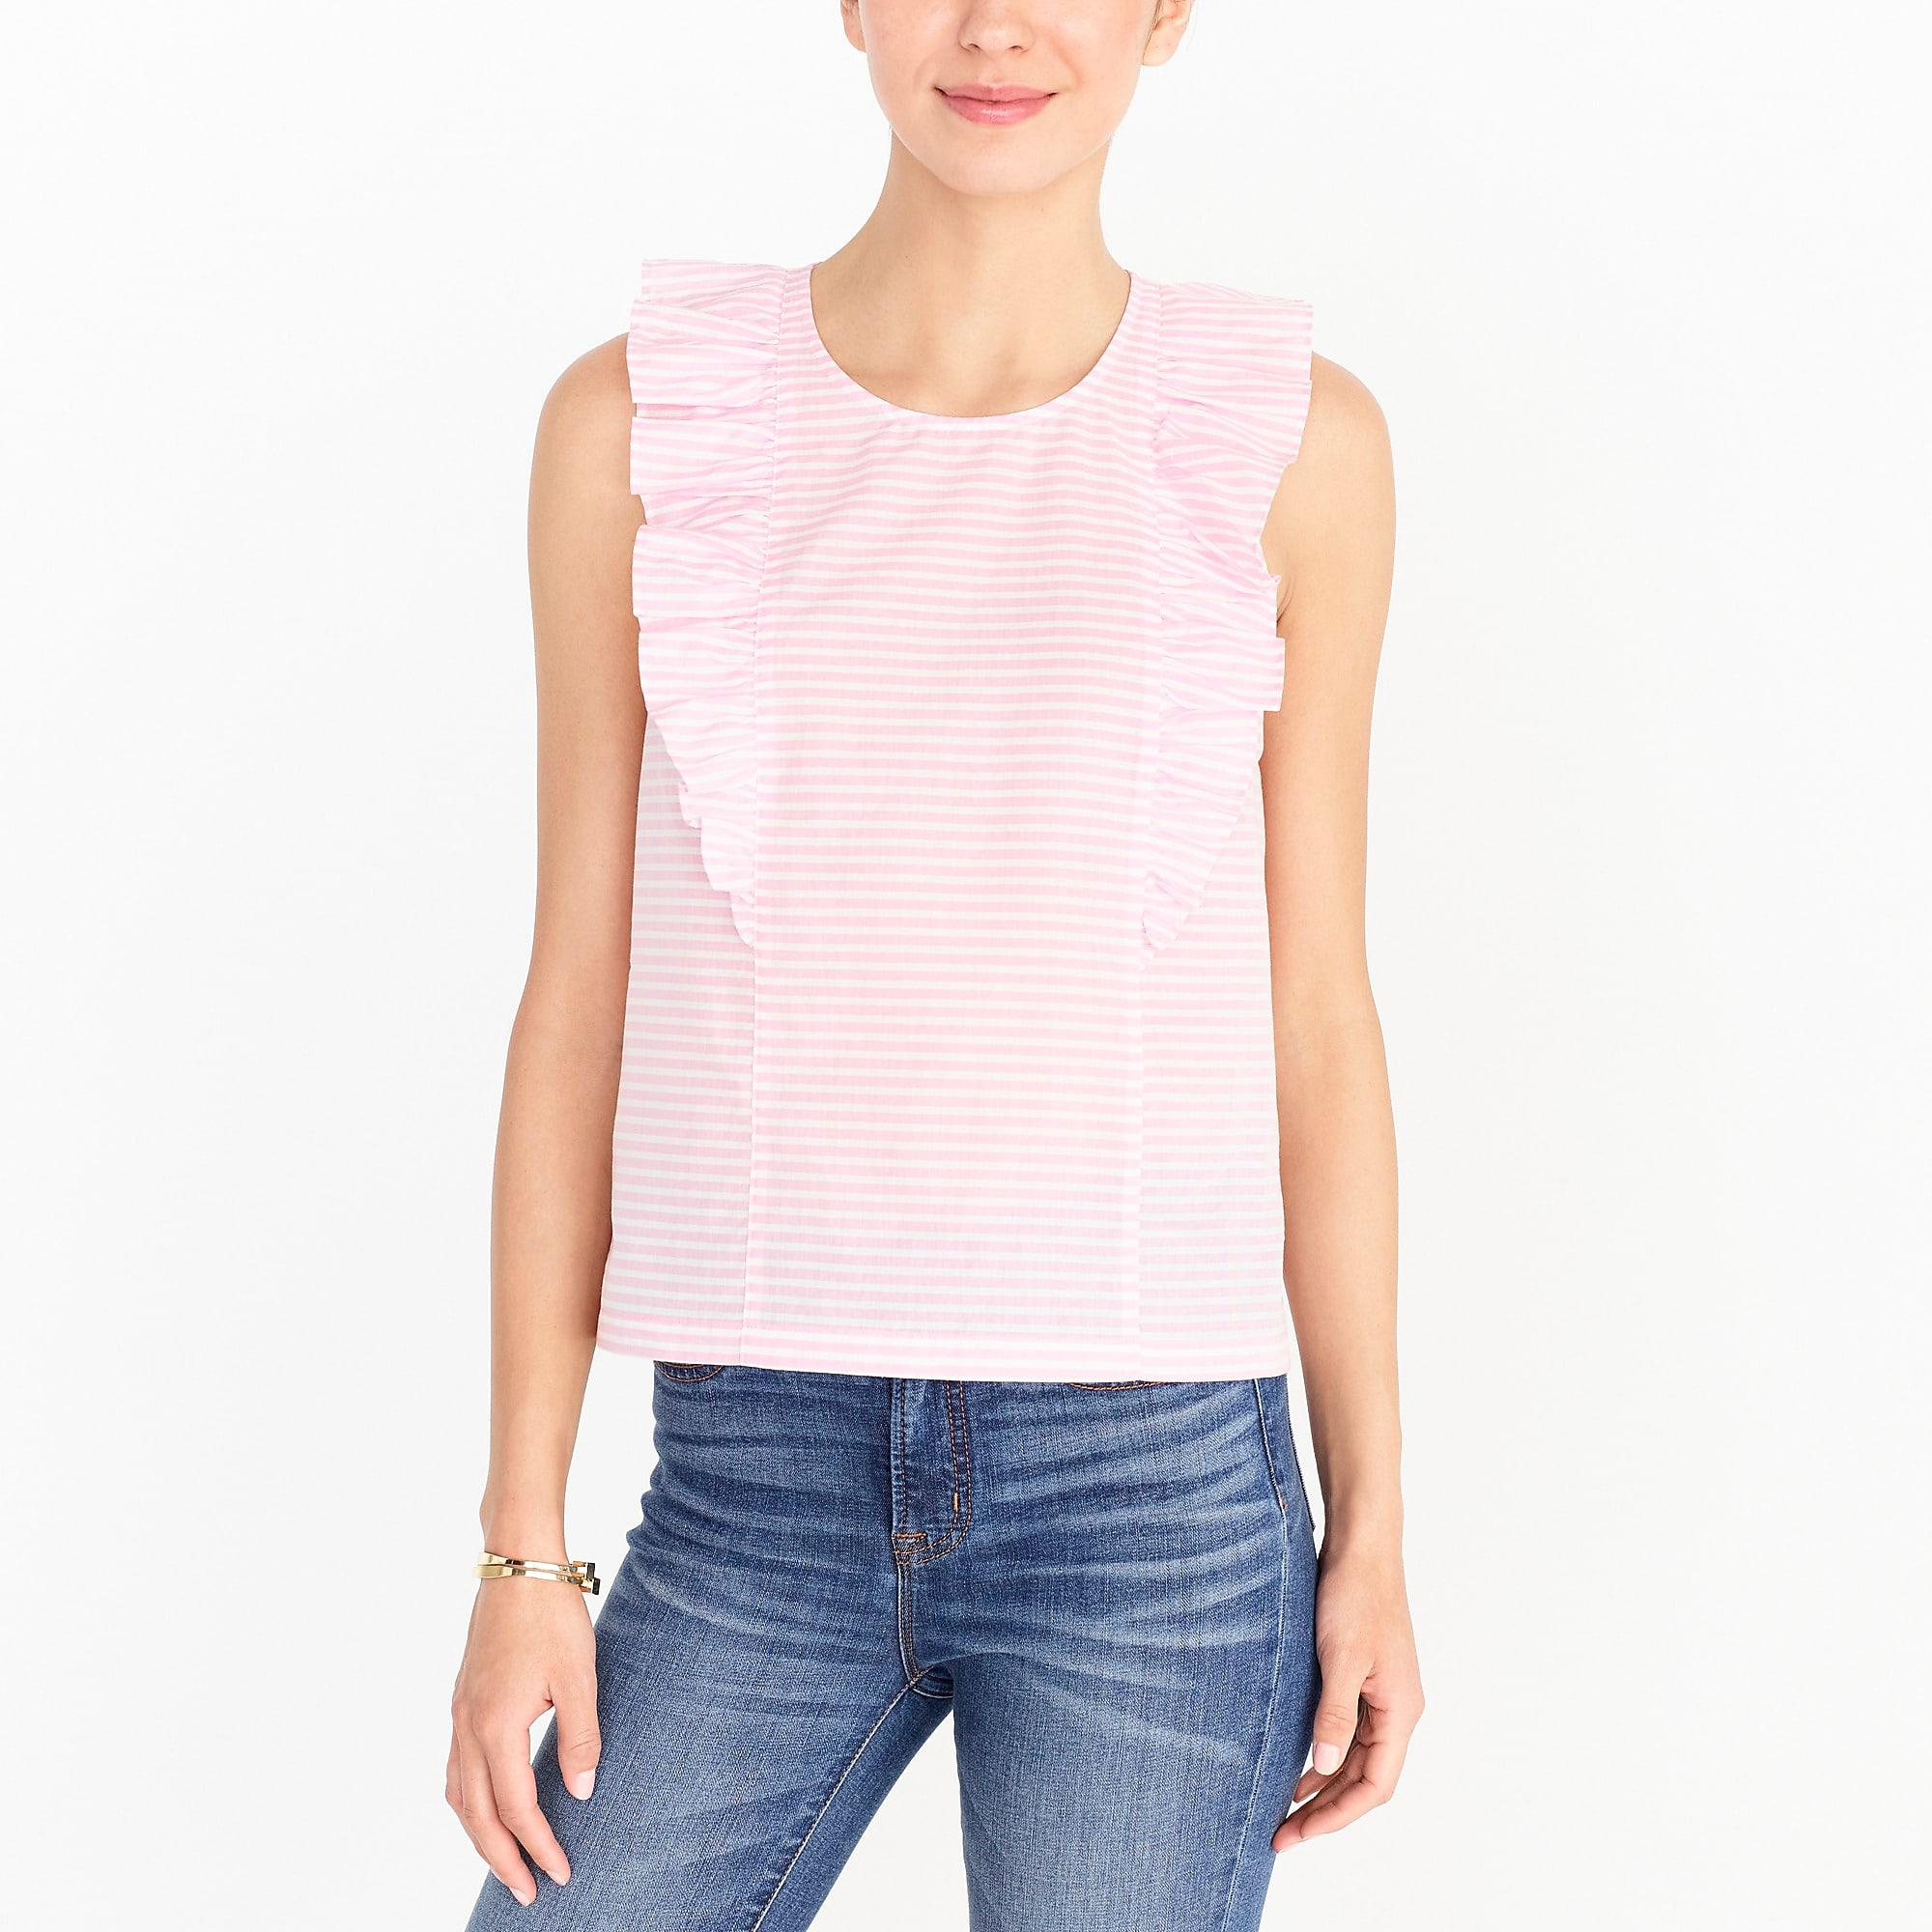 J.CREW WOMENS Stripe silk back linen tank top NWT jcrew grey pink S L